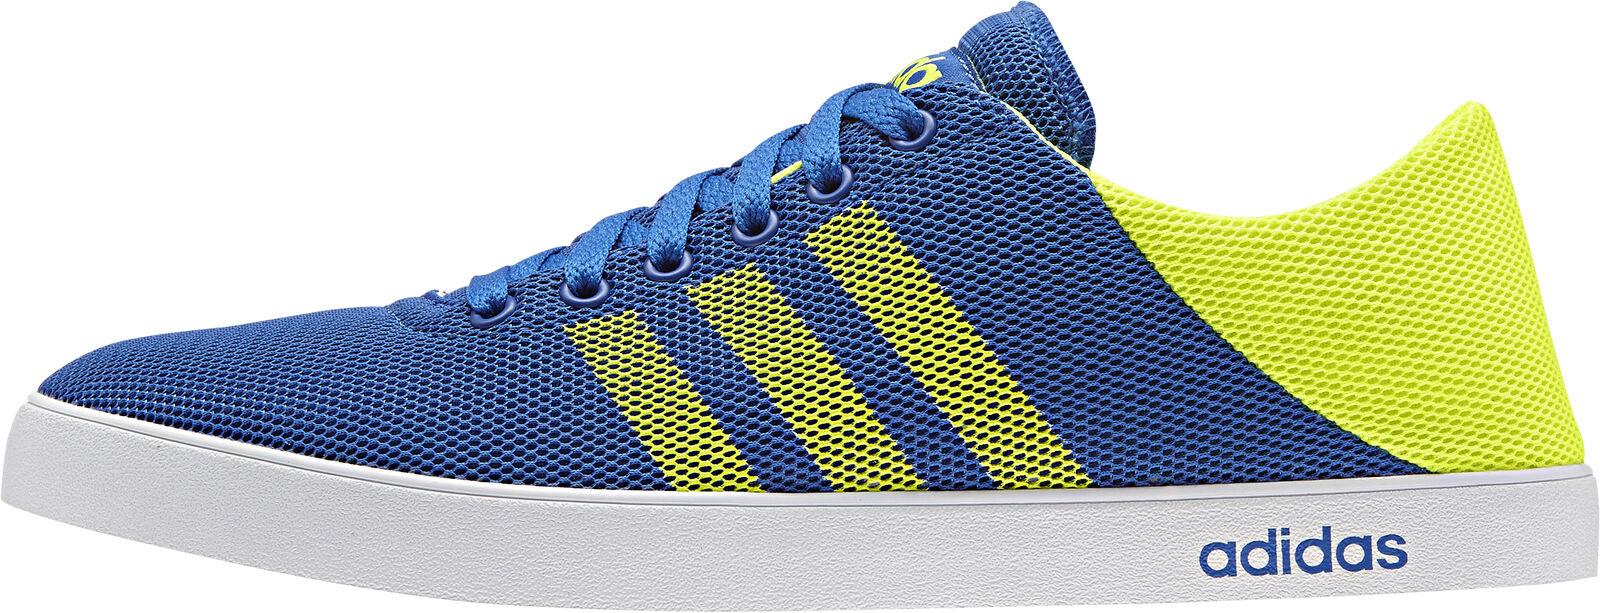 Adidas VS Easy Vulc  Mens Trainers - blueeeeeeeee  hastened to see